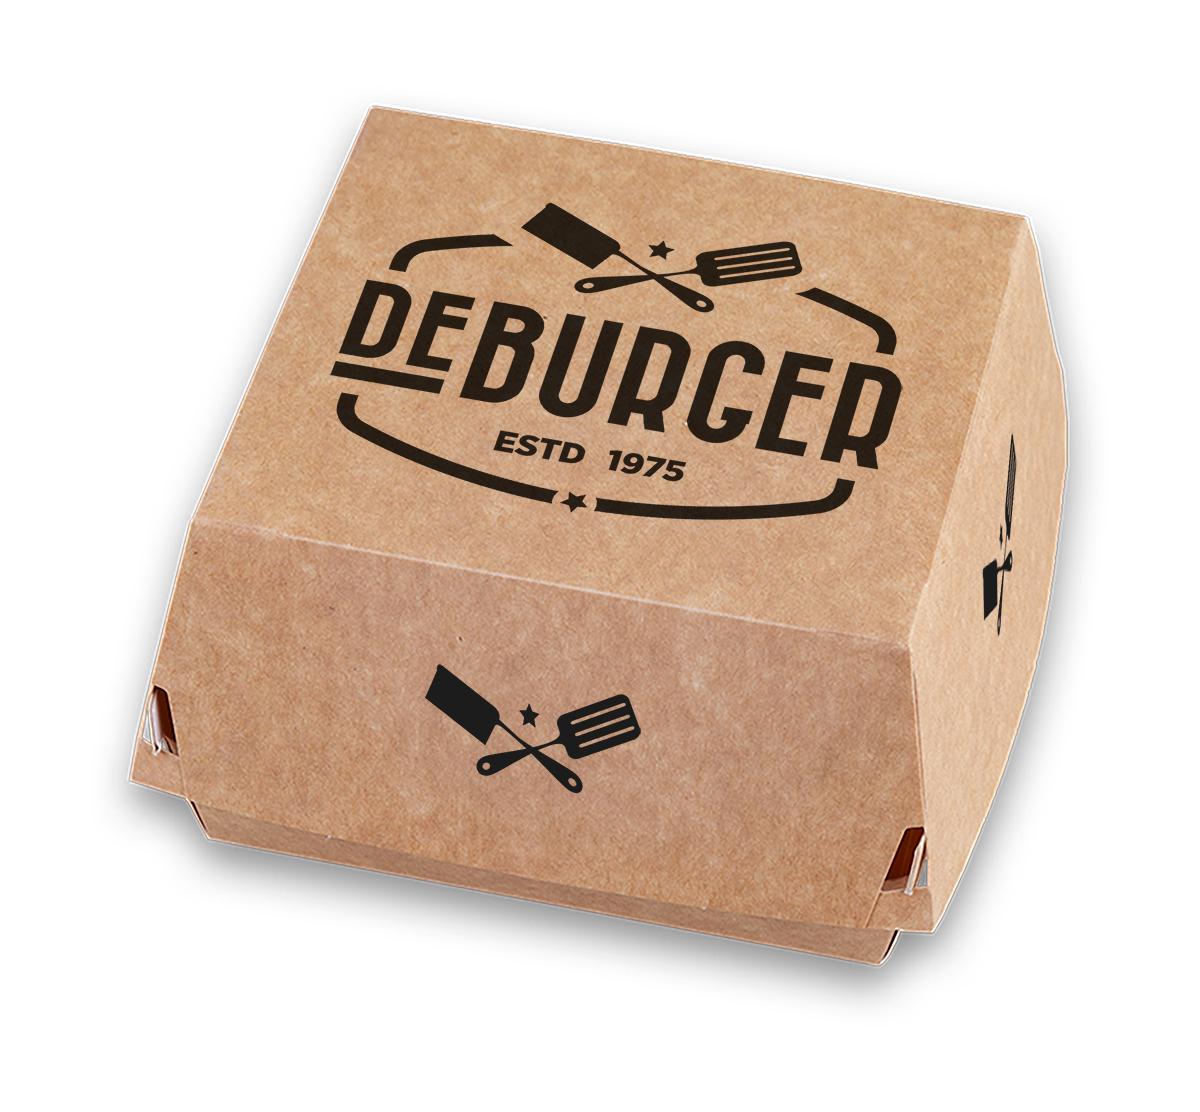 Hamburgerbakjes met eigen logo